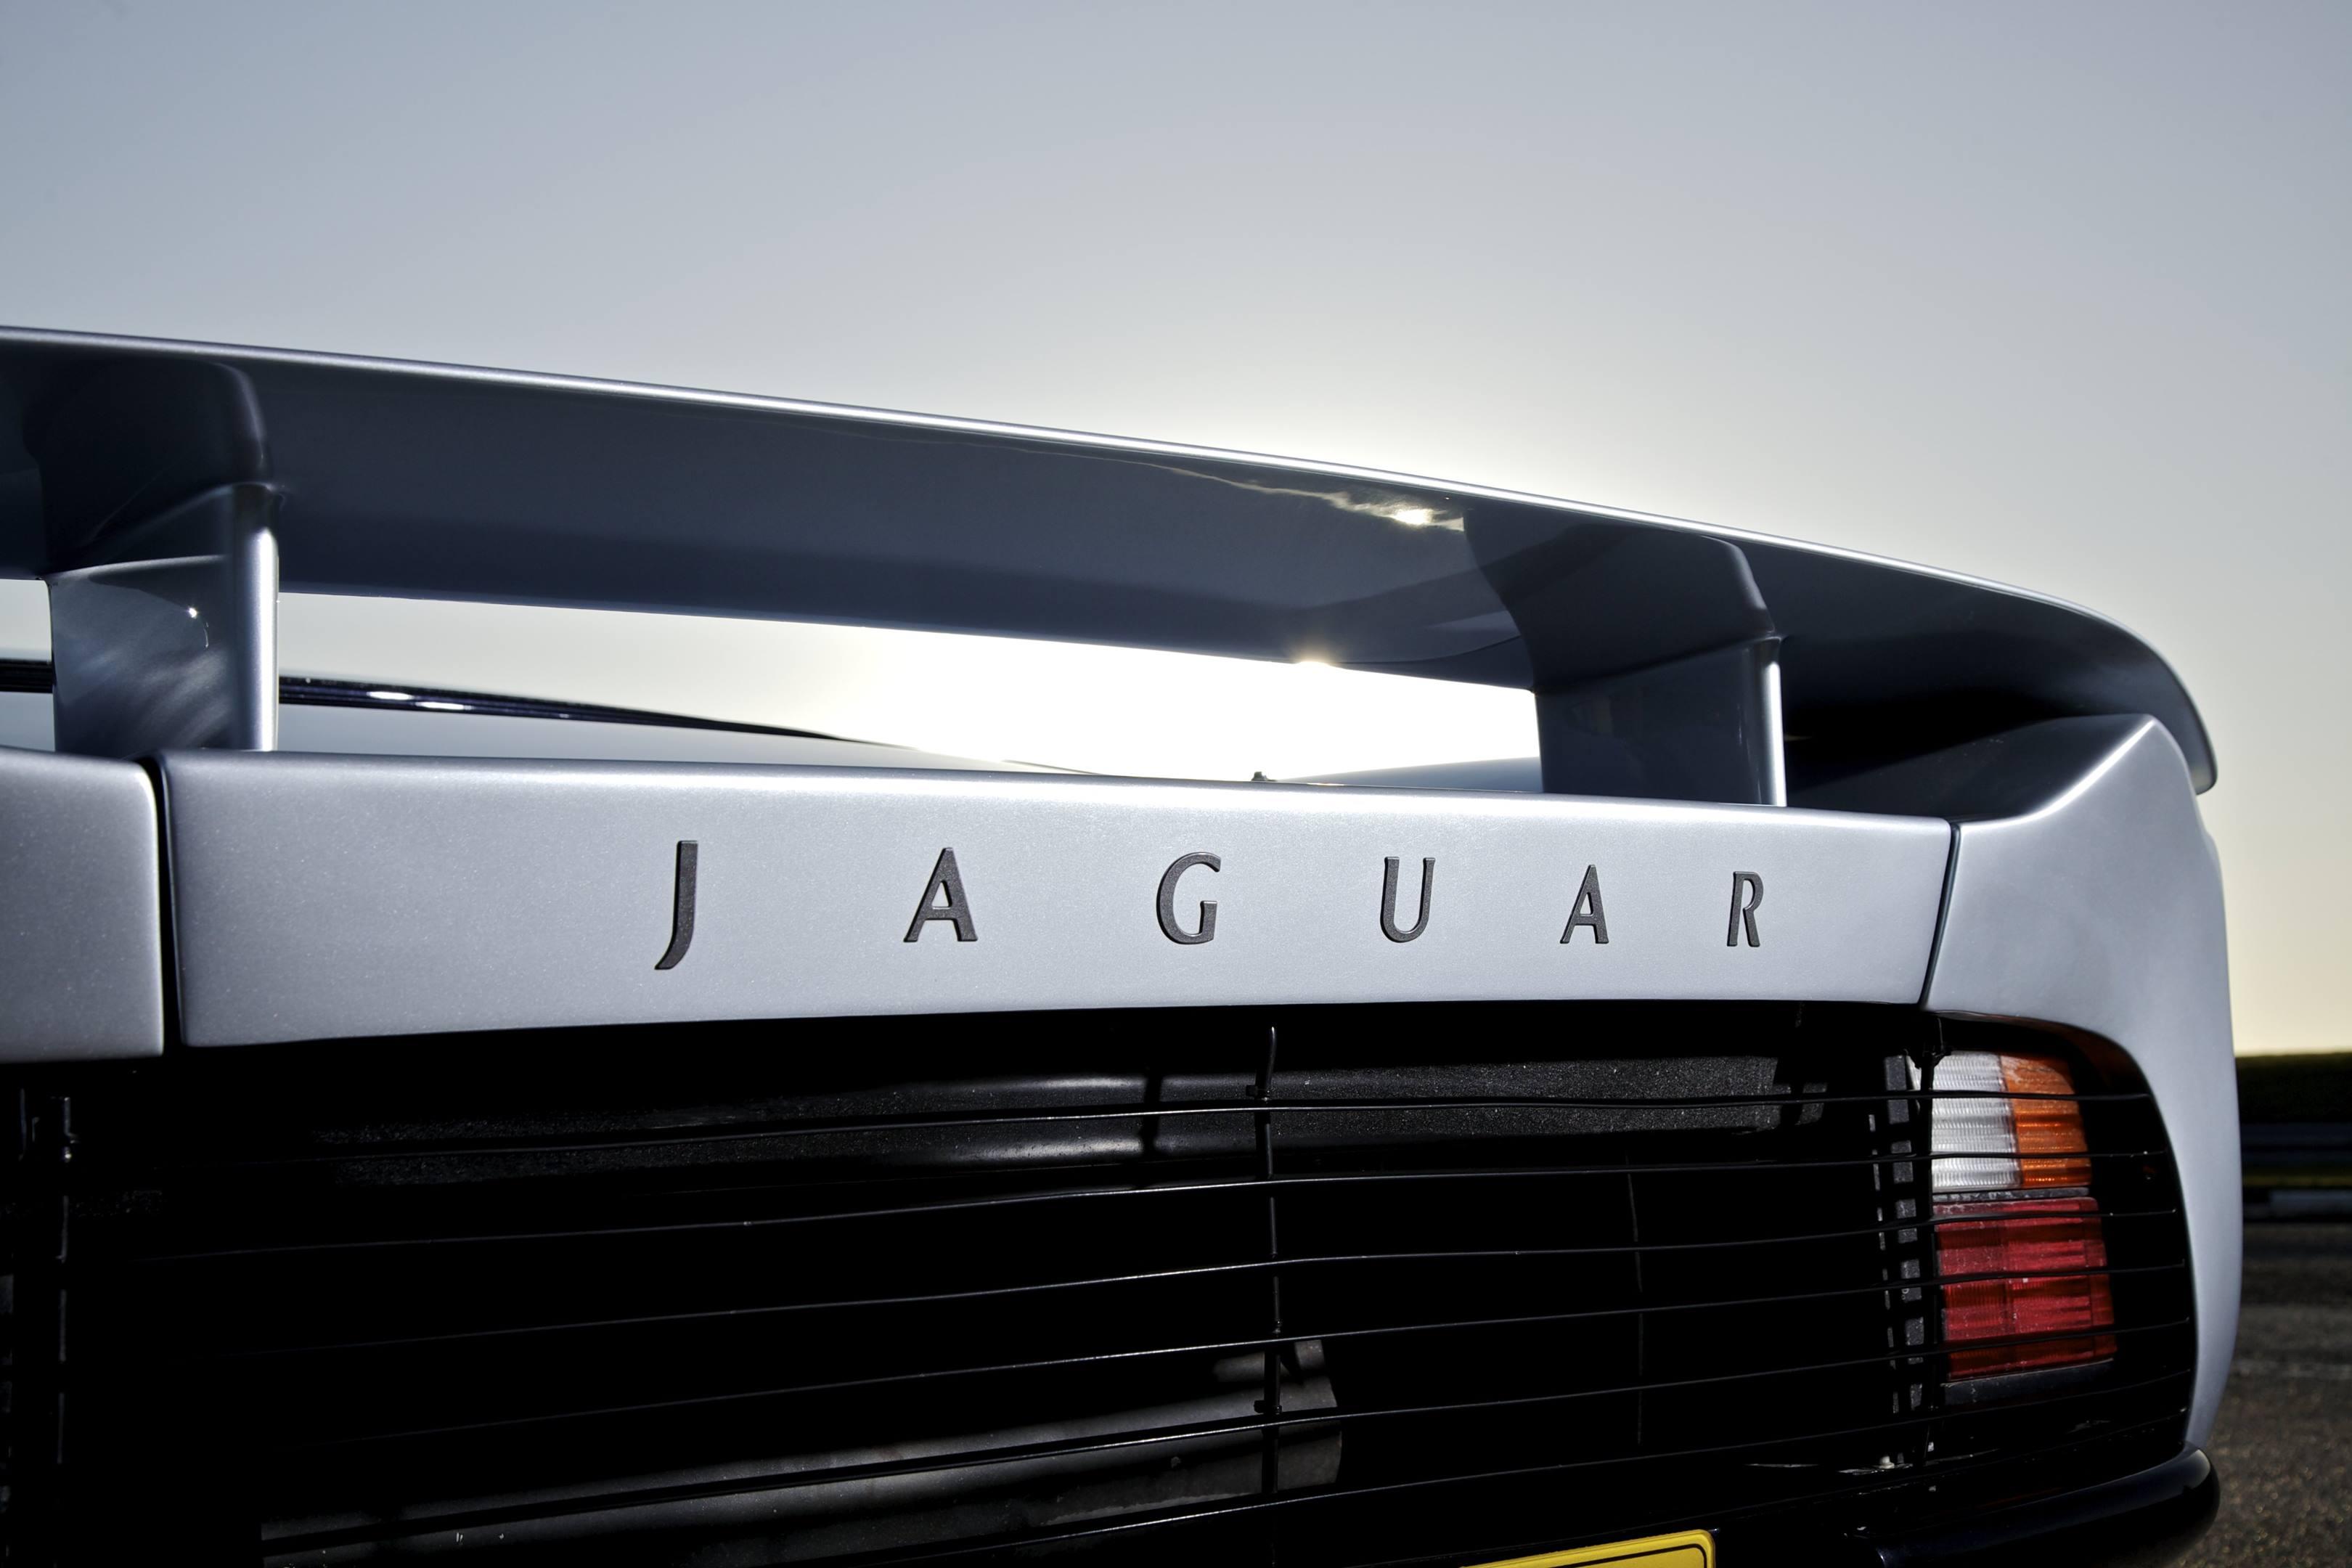 Jaguar XJ220 rear detail